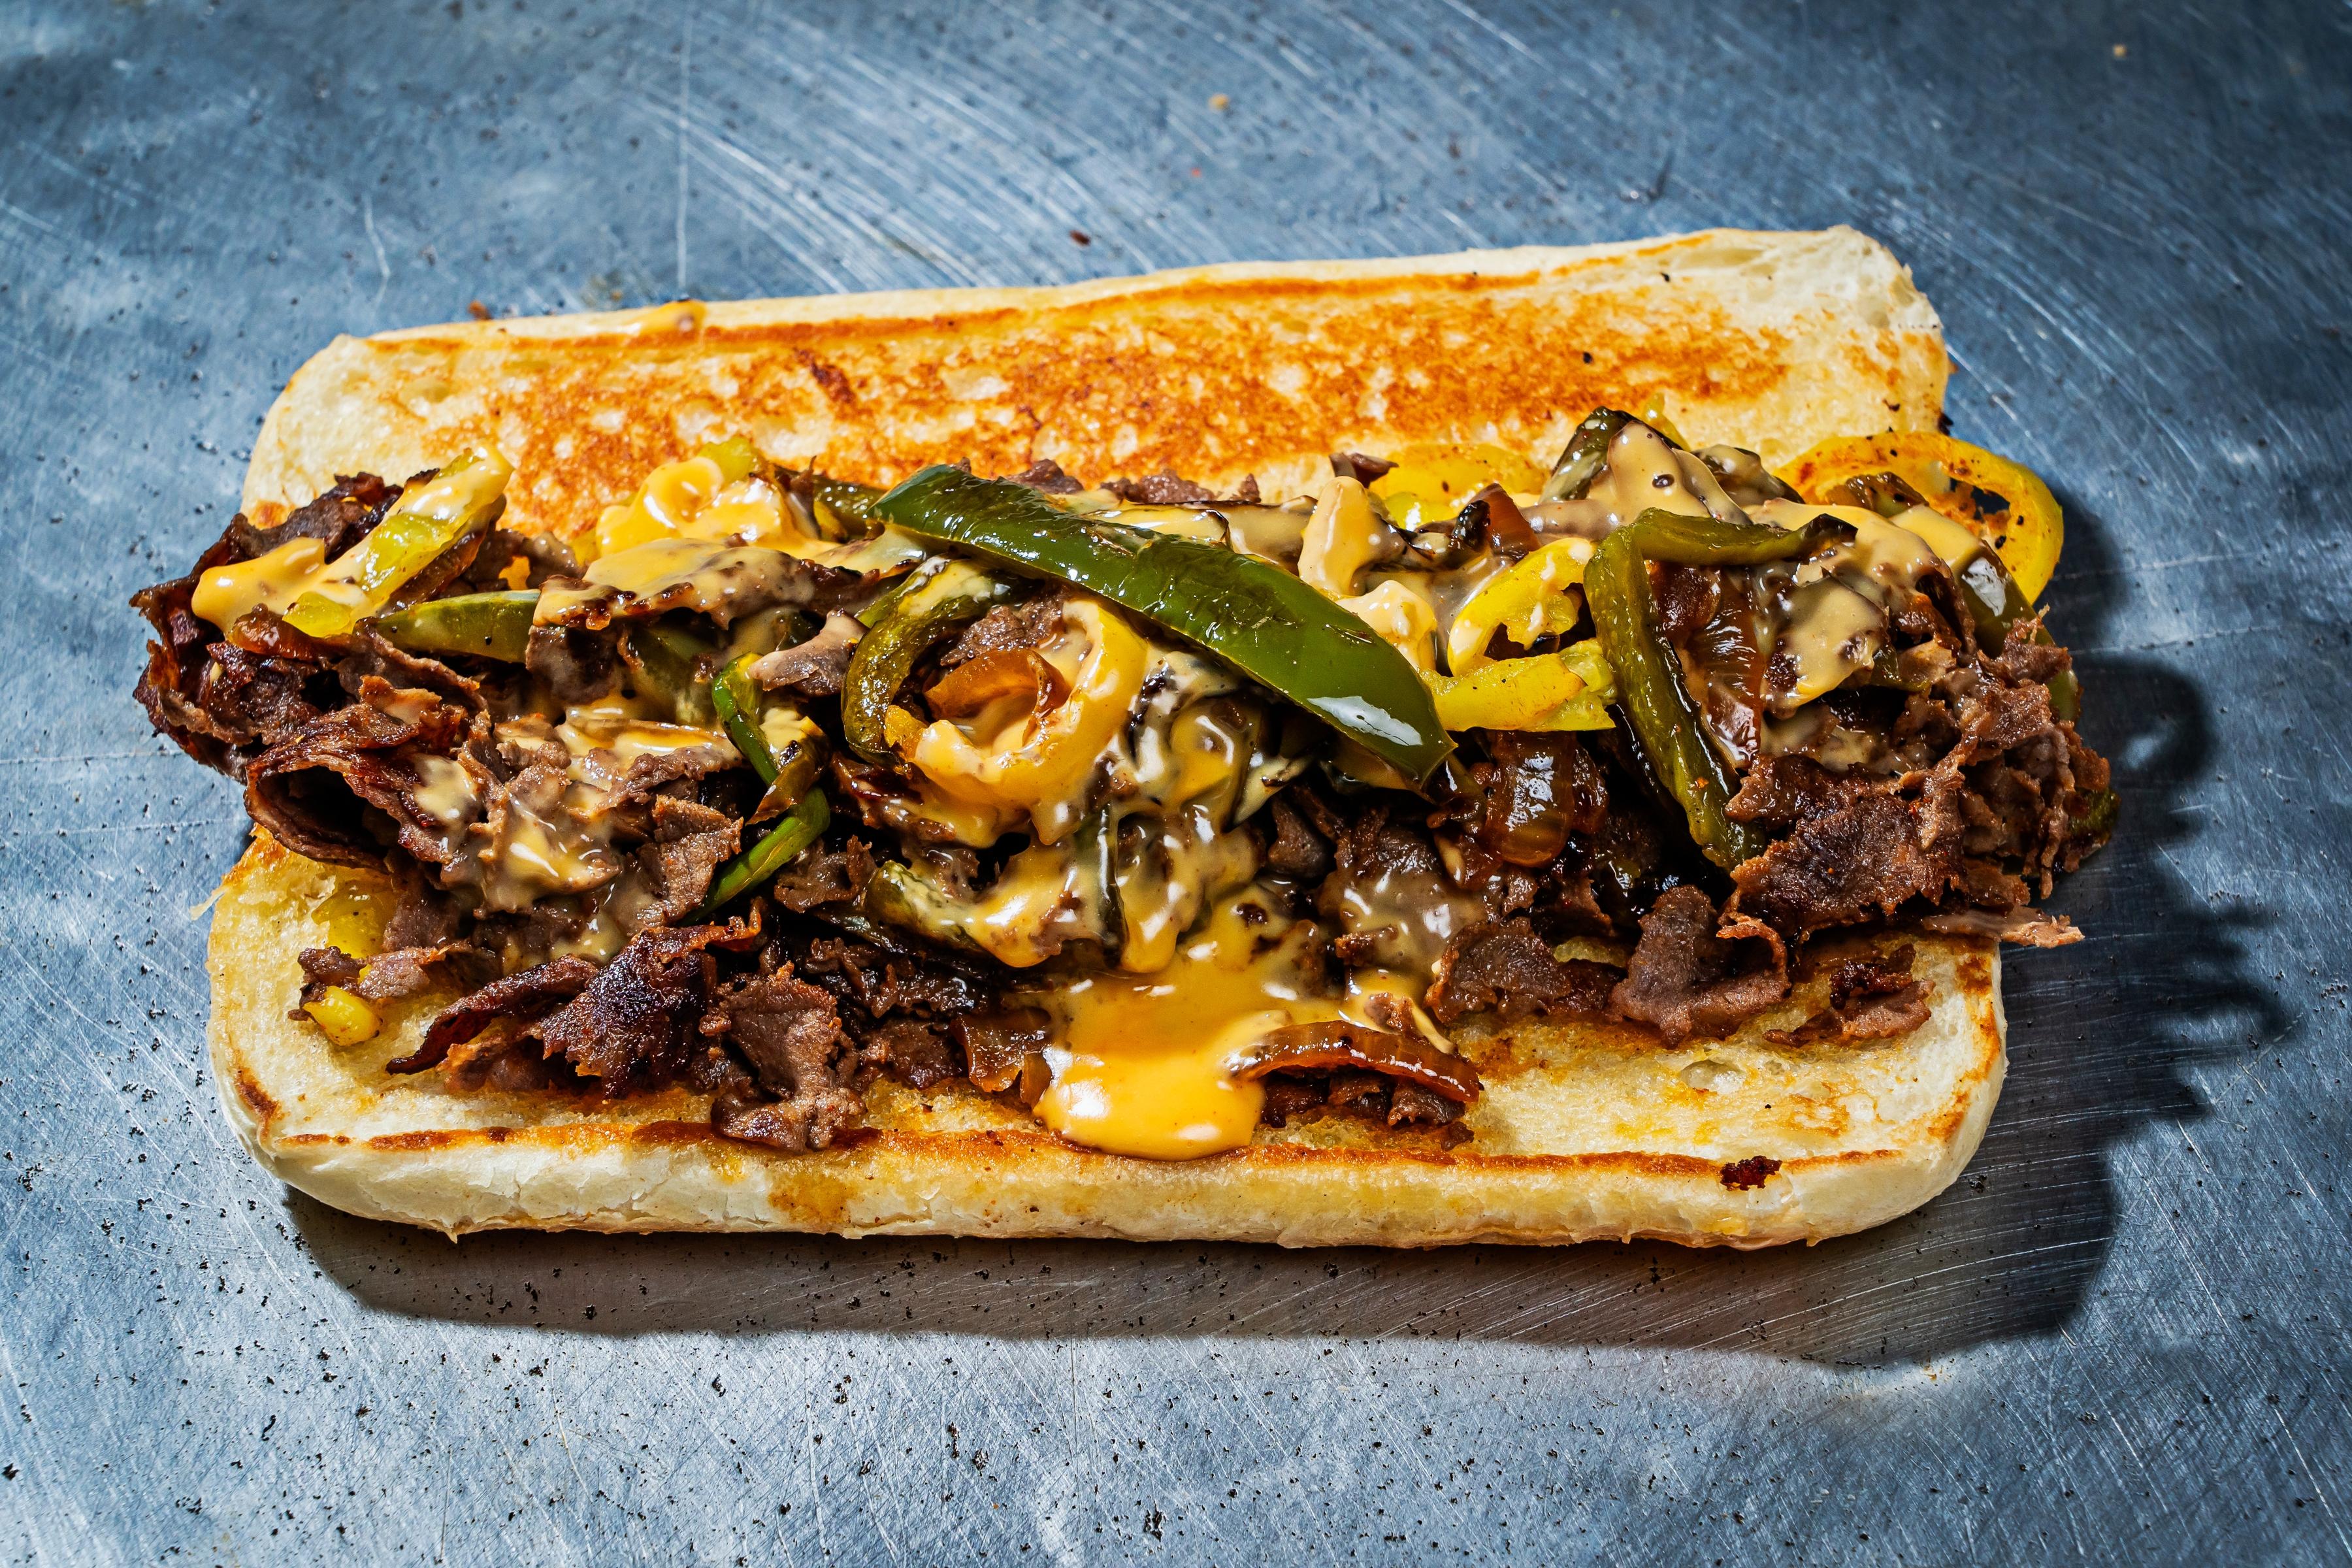 A pepper steak sandwich from Satellite